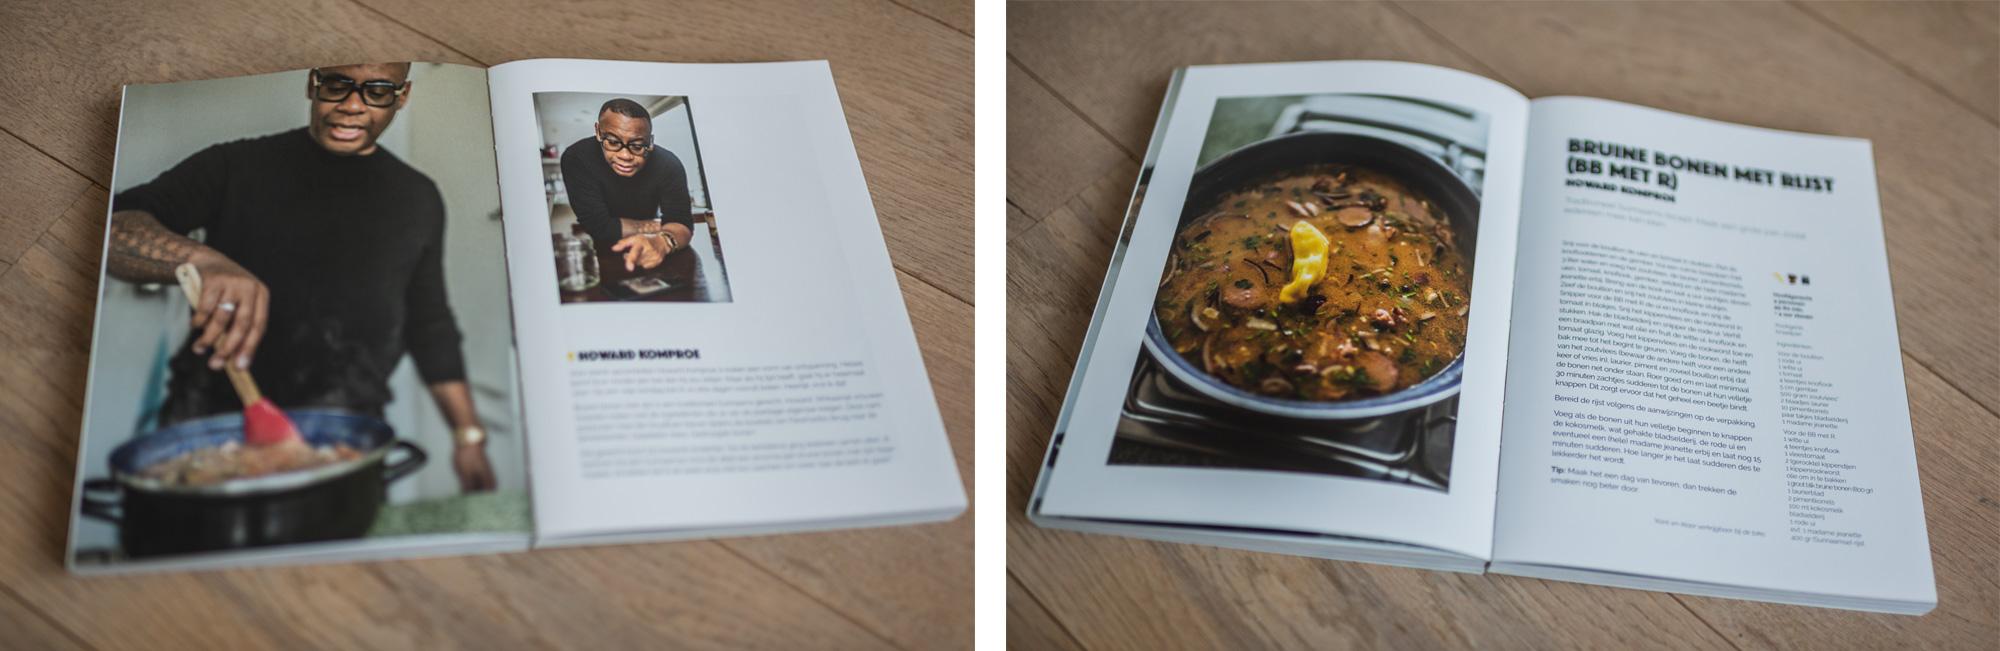 kookboek2.jpg